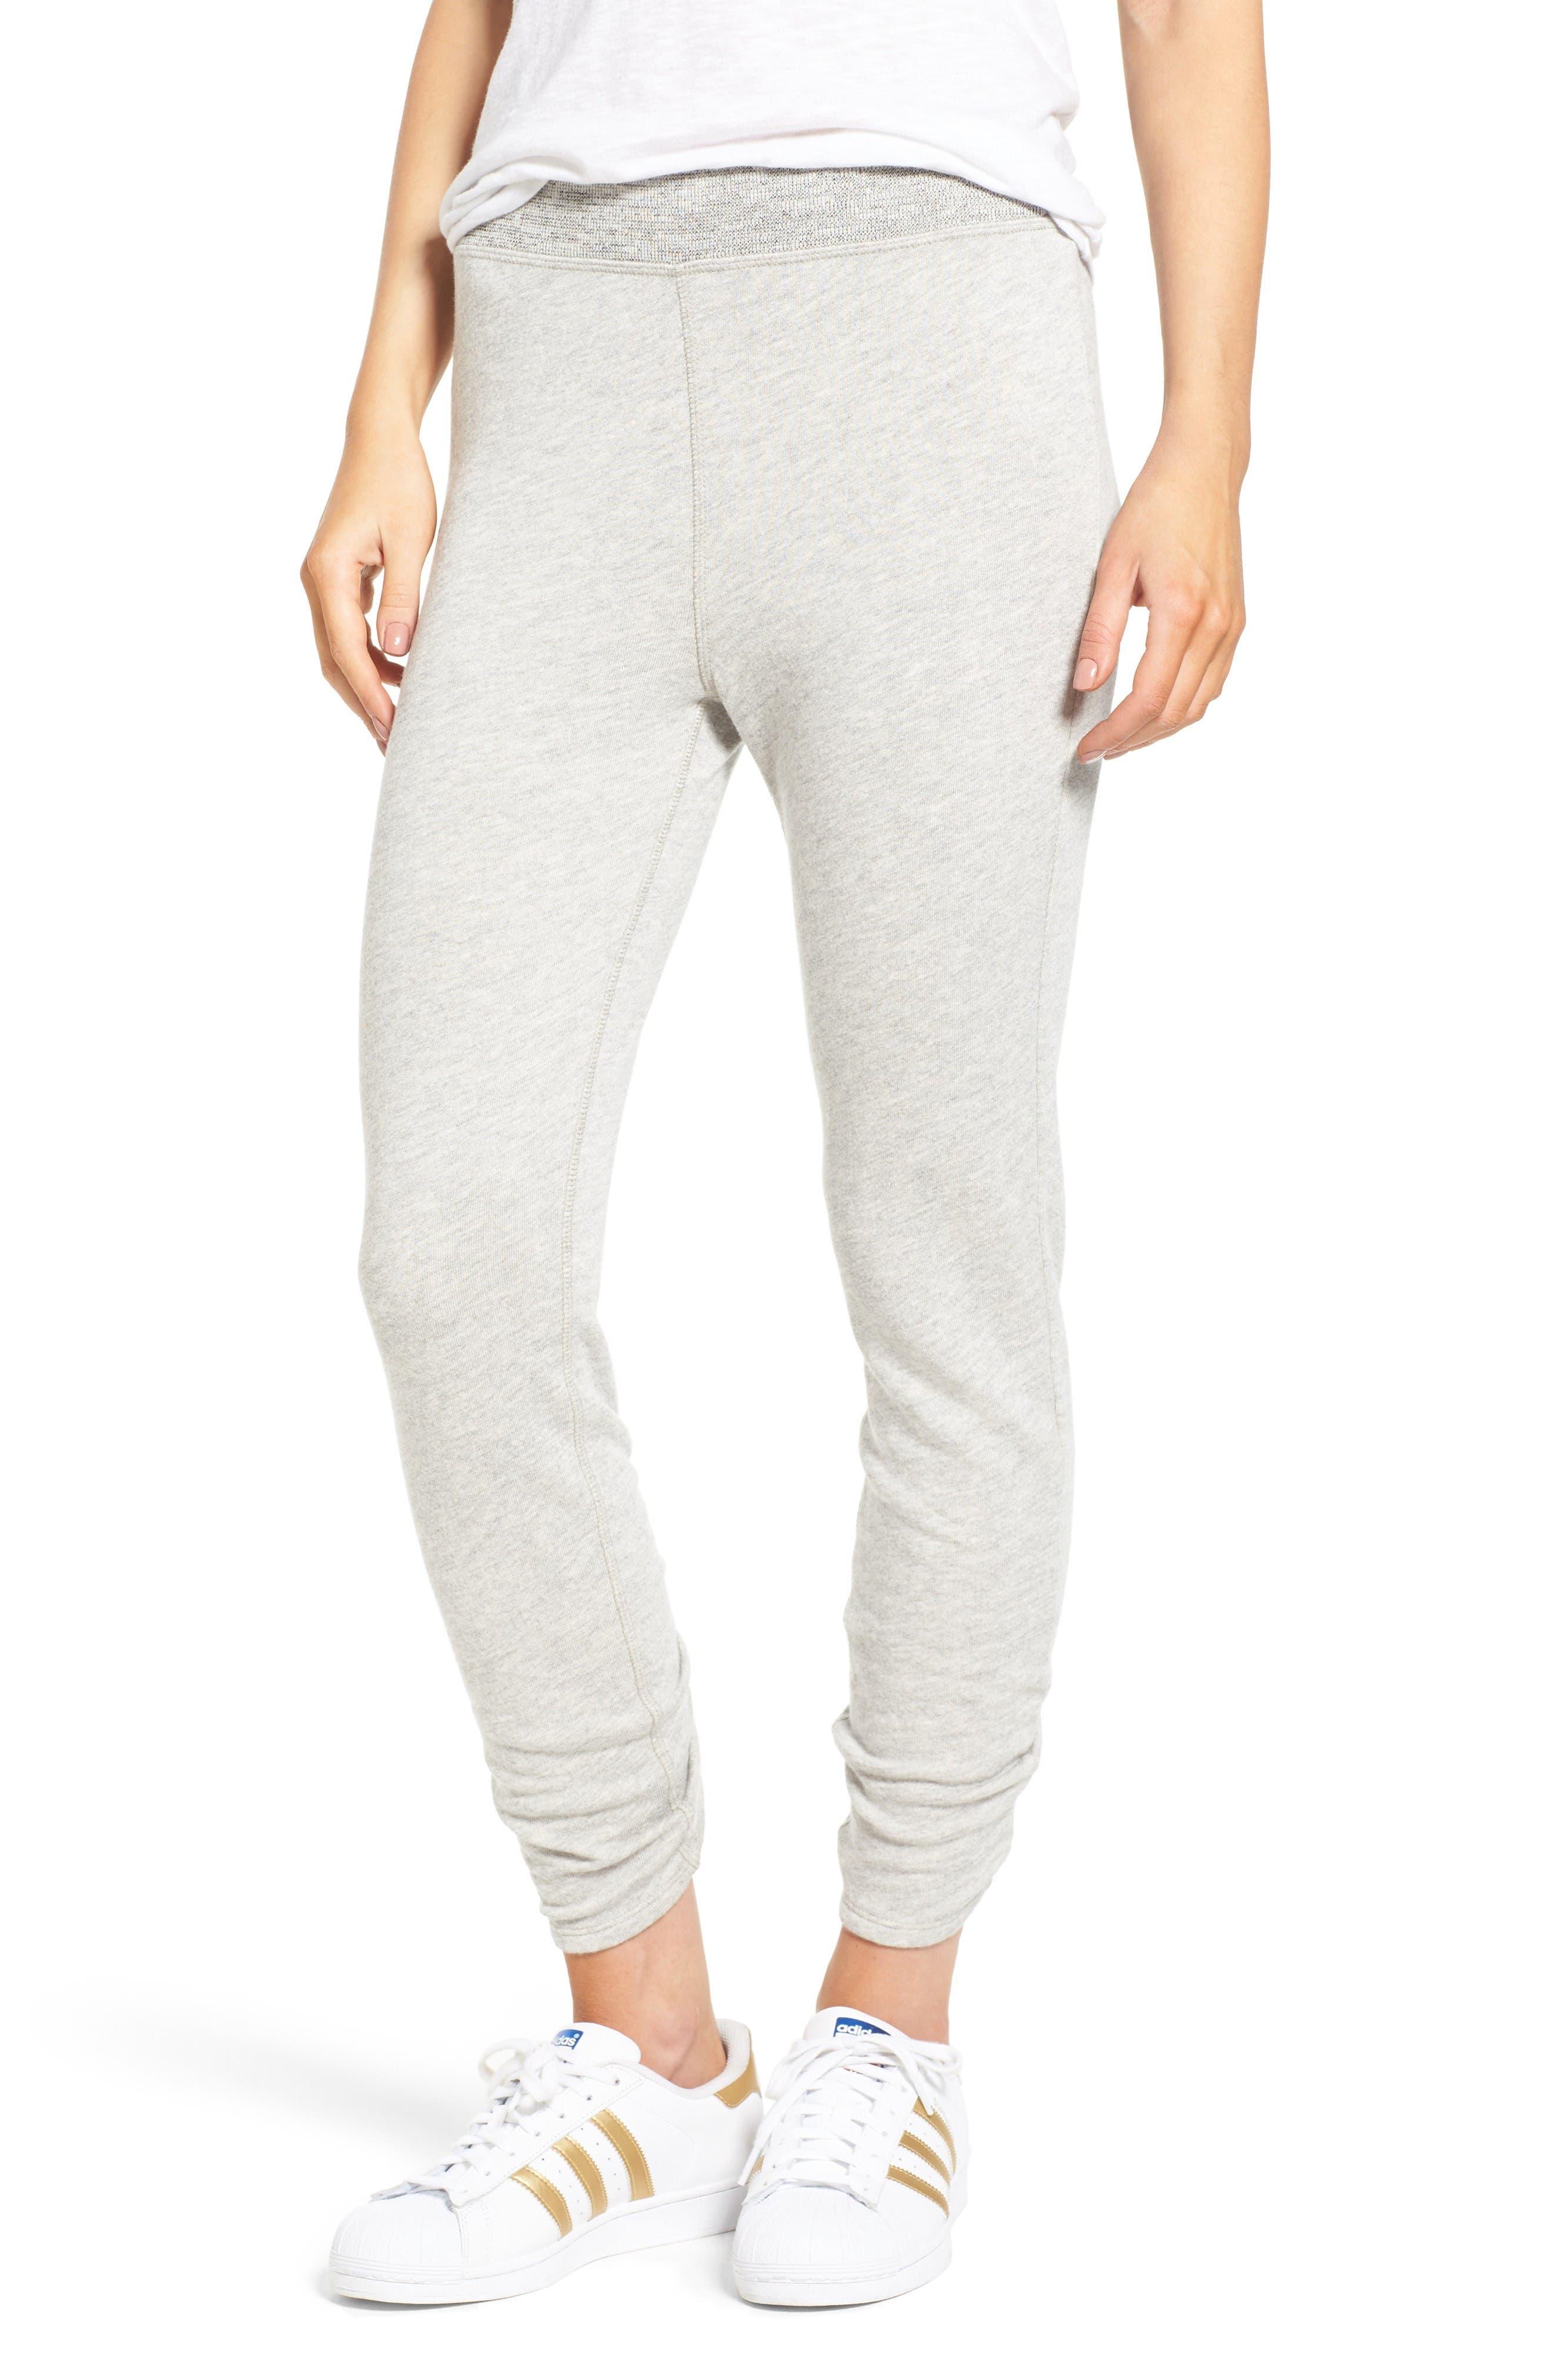 Isla High Waist Crop Sweatpants,                             Main thumbnail 1, color,                             Heather Grey